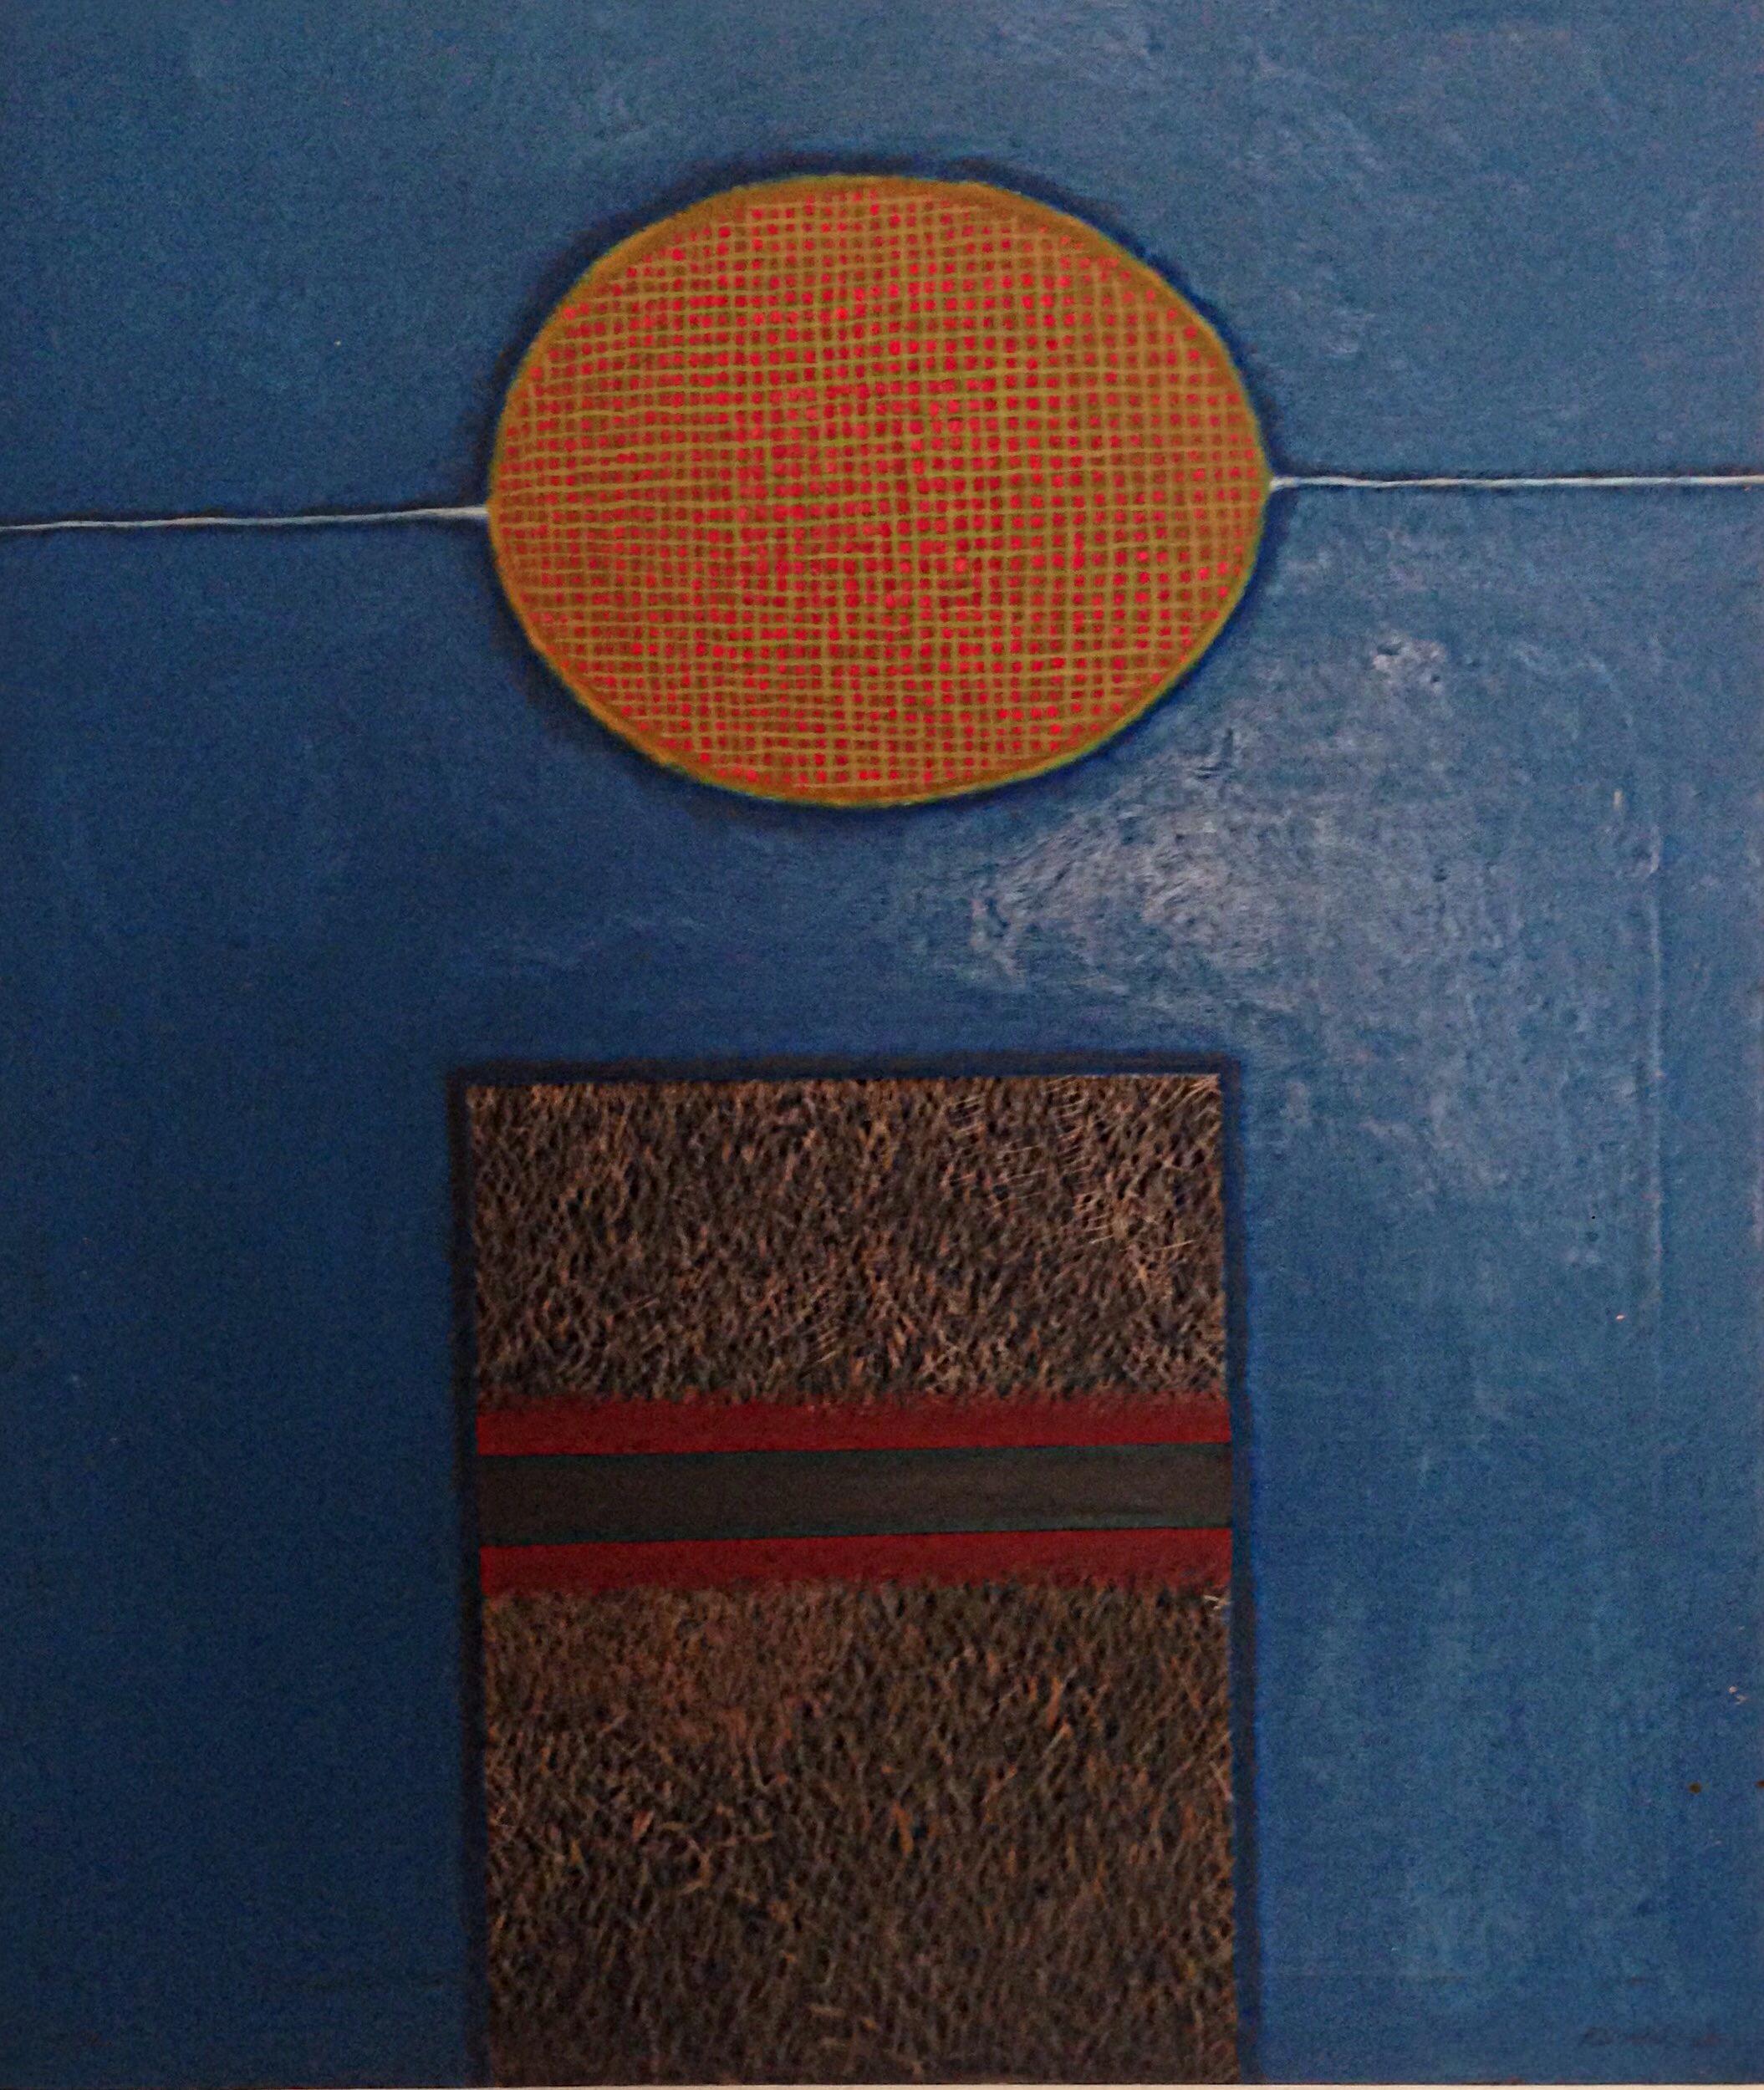 Roberto Donis, Azul